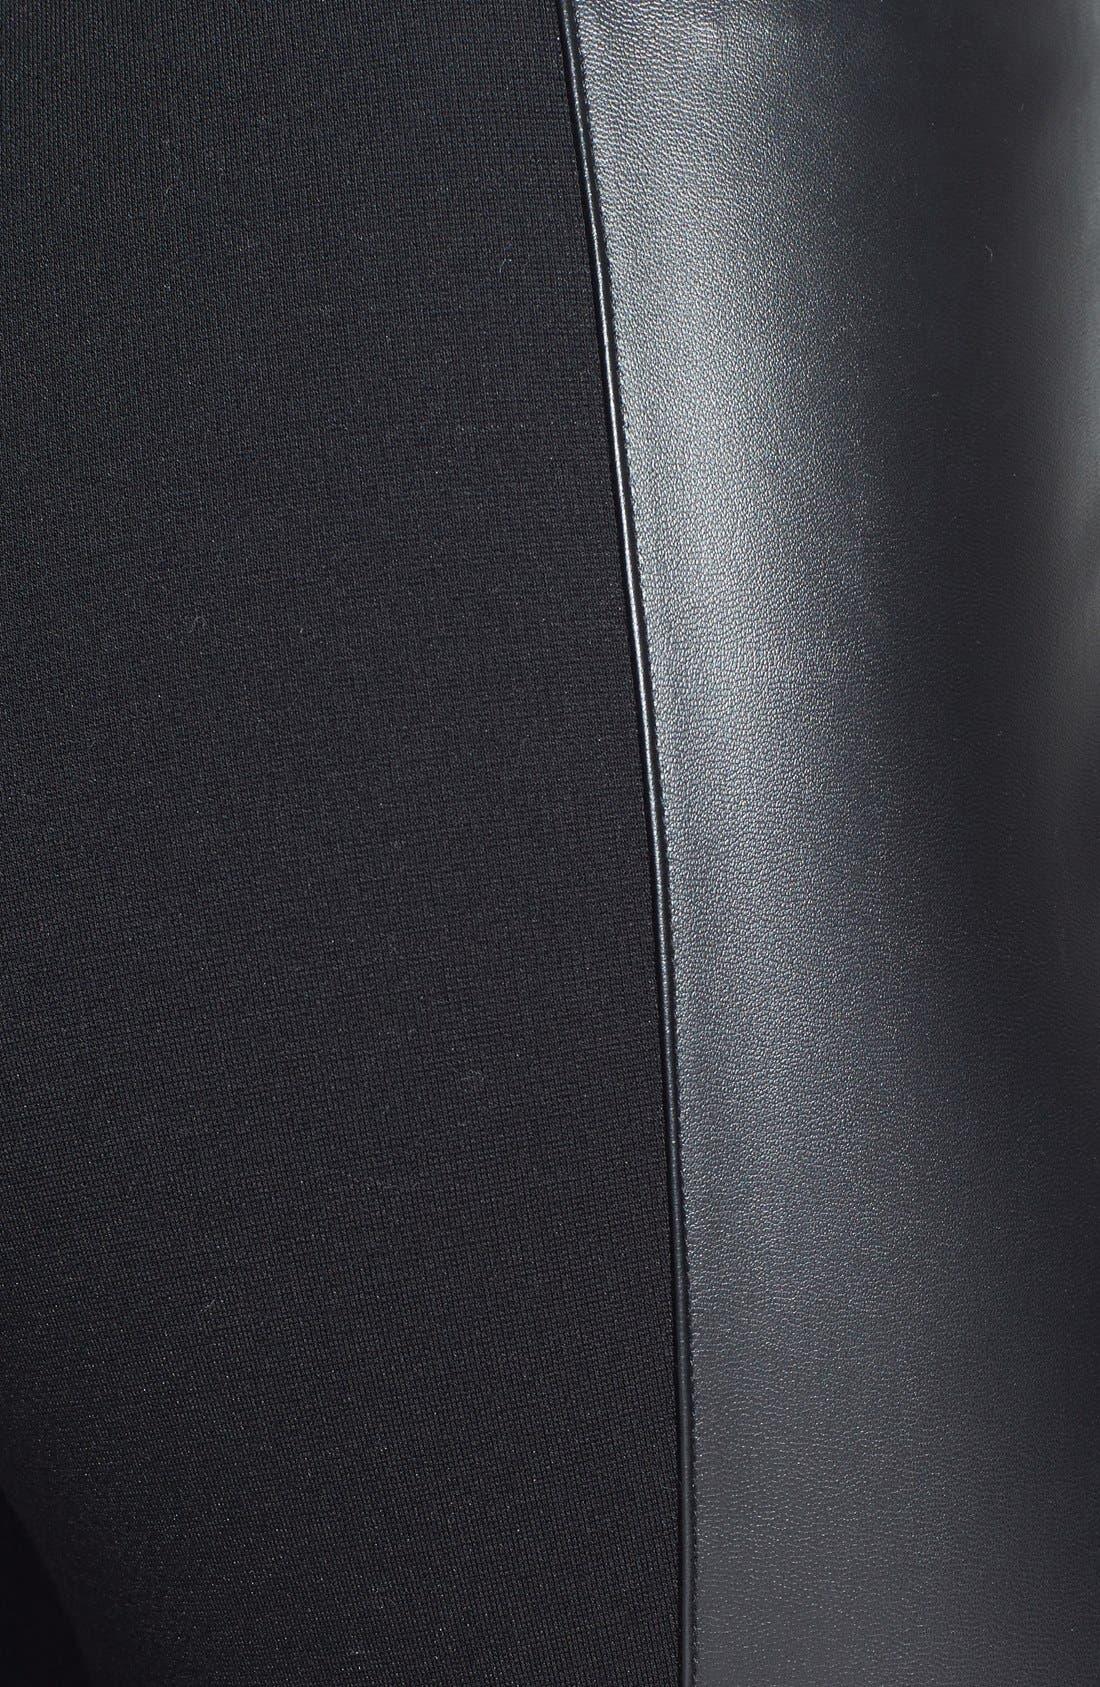 Faux Leather Stripe Ankle Zip Moto Leggings,                             Alternate thumbnail 3, color,                             001